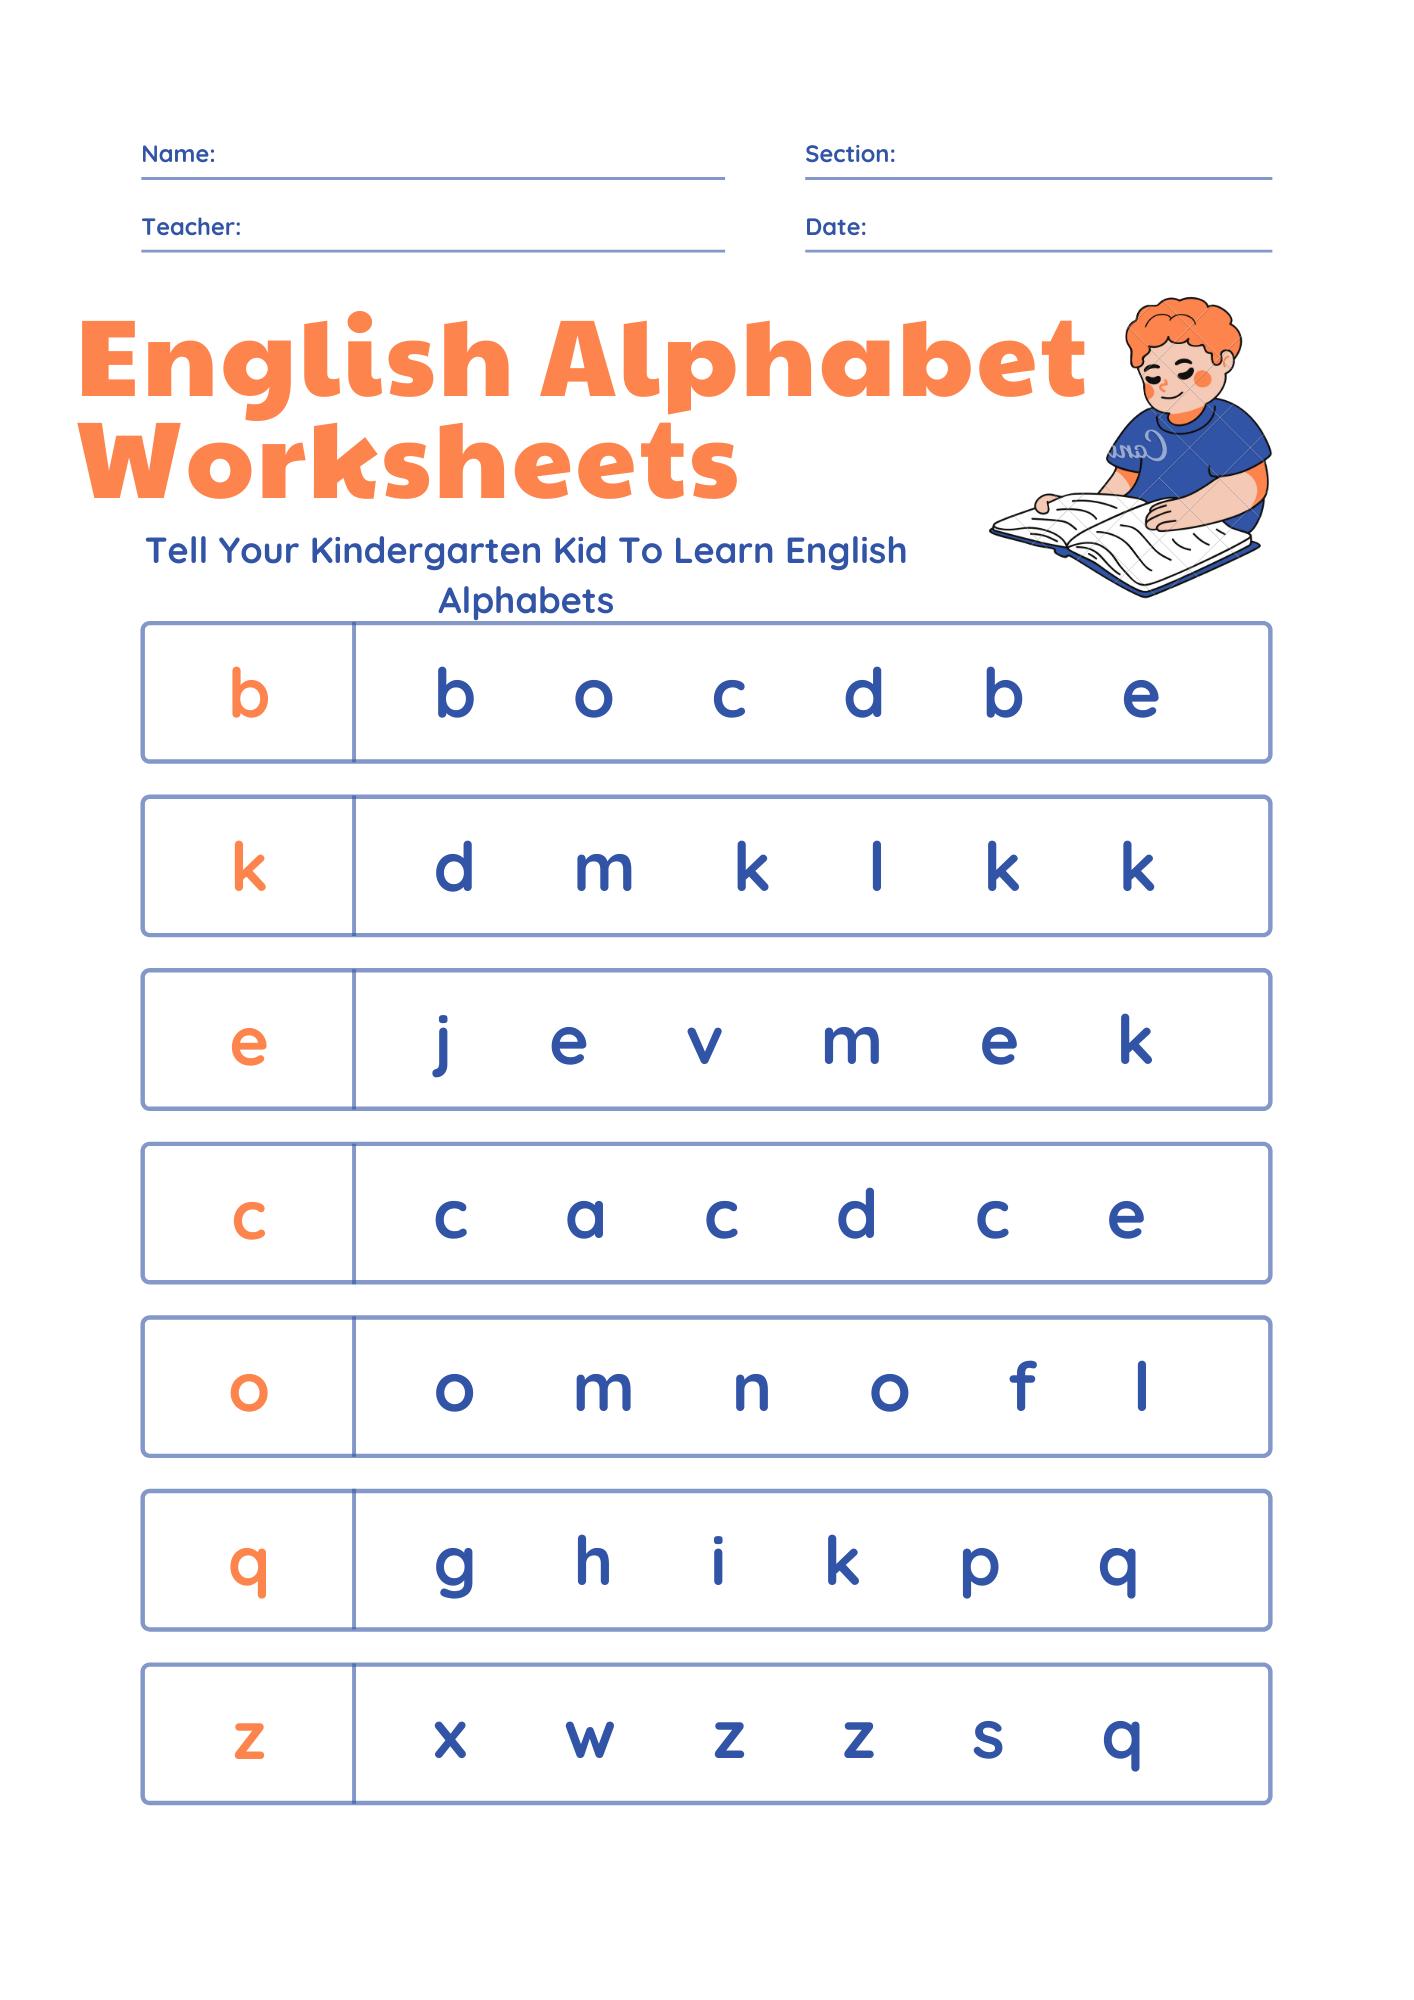 English Alphabet Worksheets For Kids Kindergarten Kindergarten Learning Kindergarten Learning Activities Kindergarten Reading Activities [ 2000 x 1414 Pixel ]